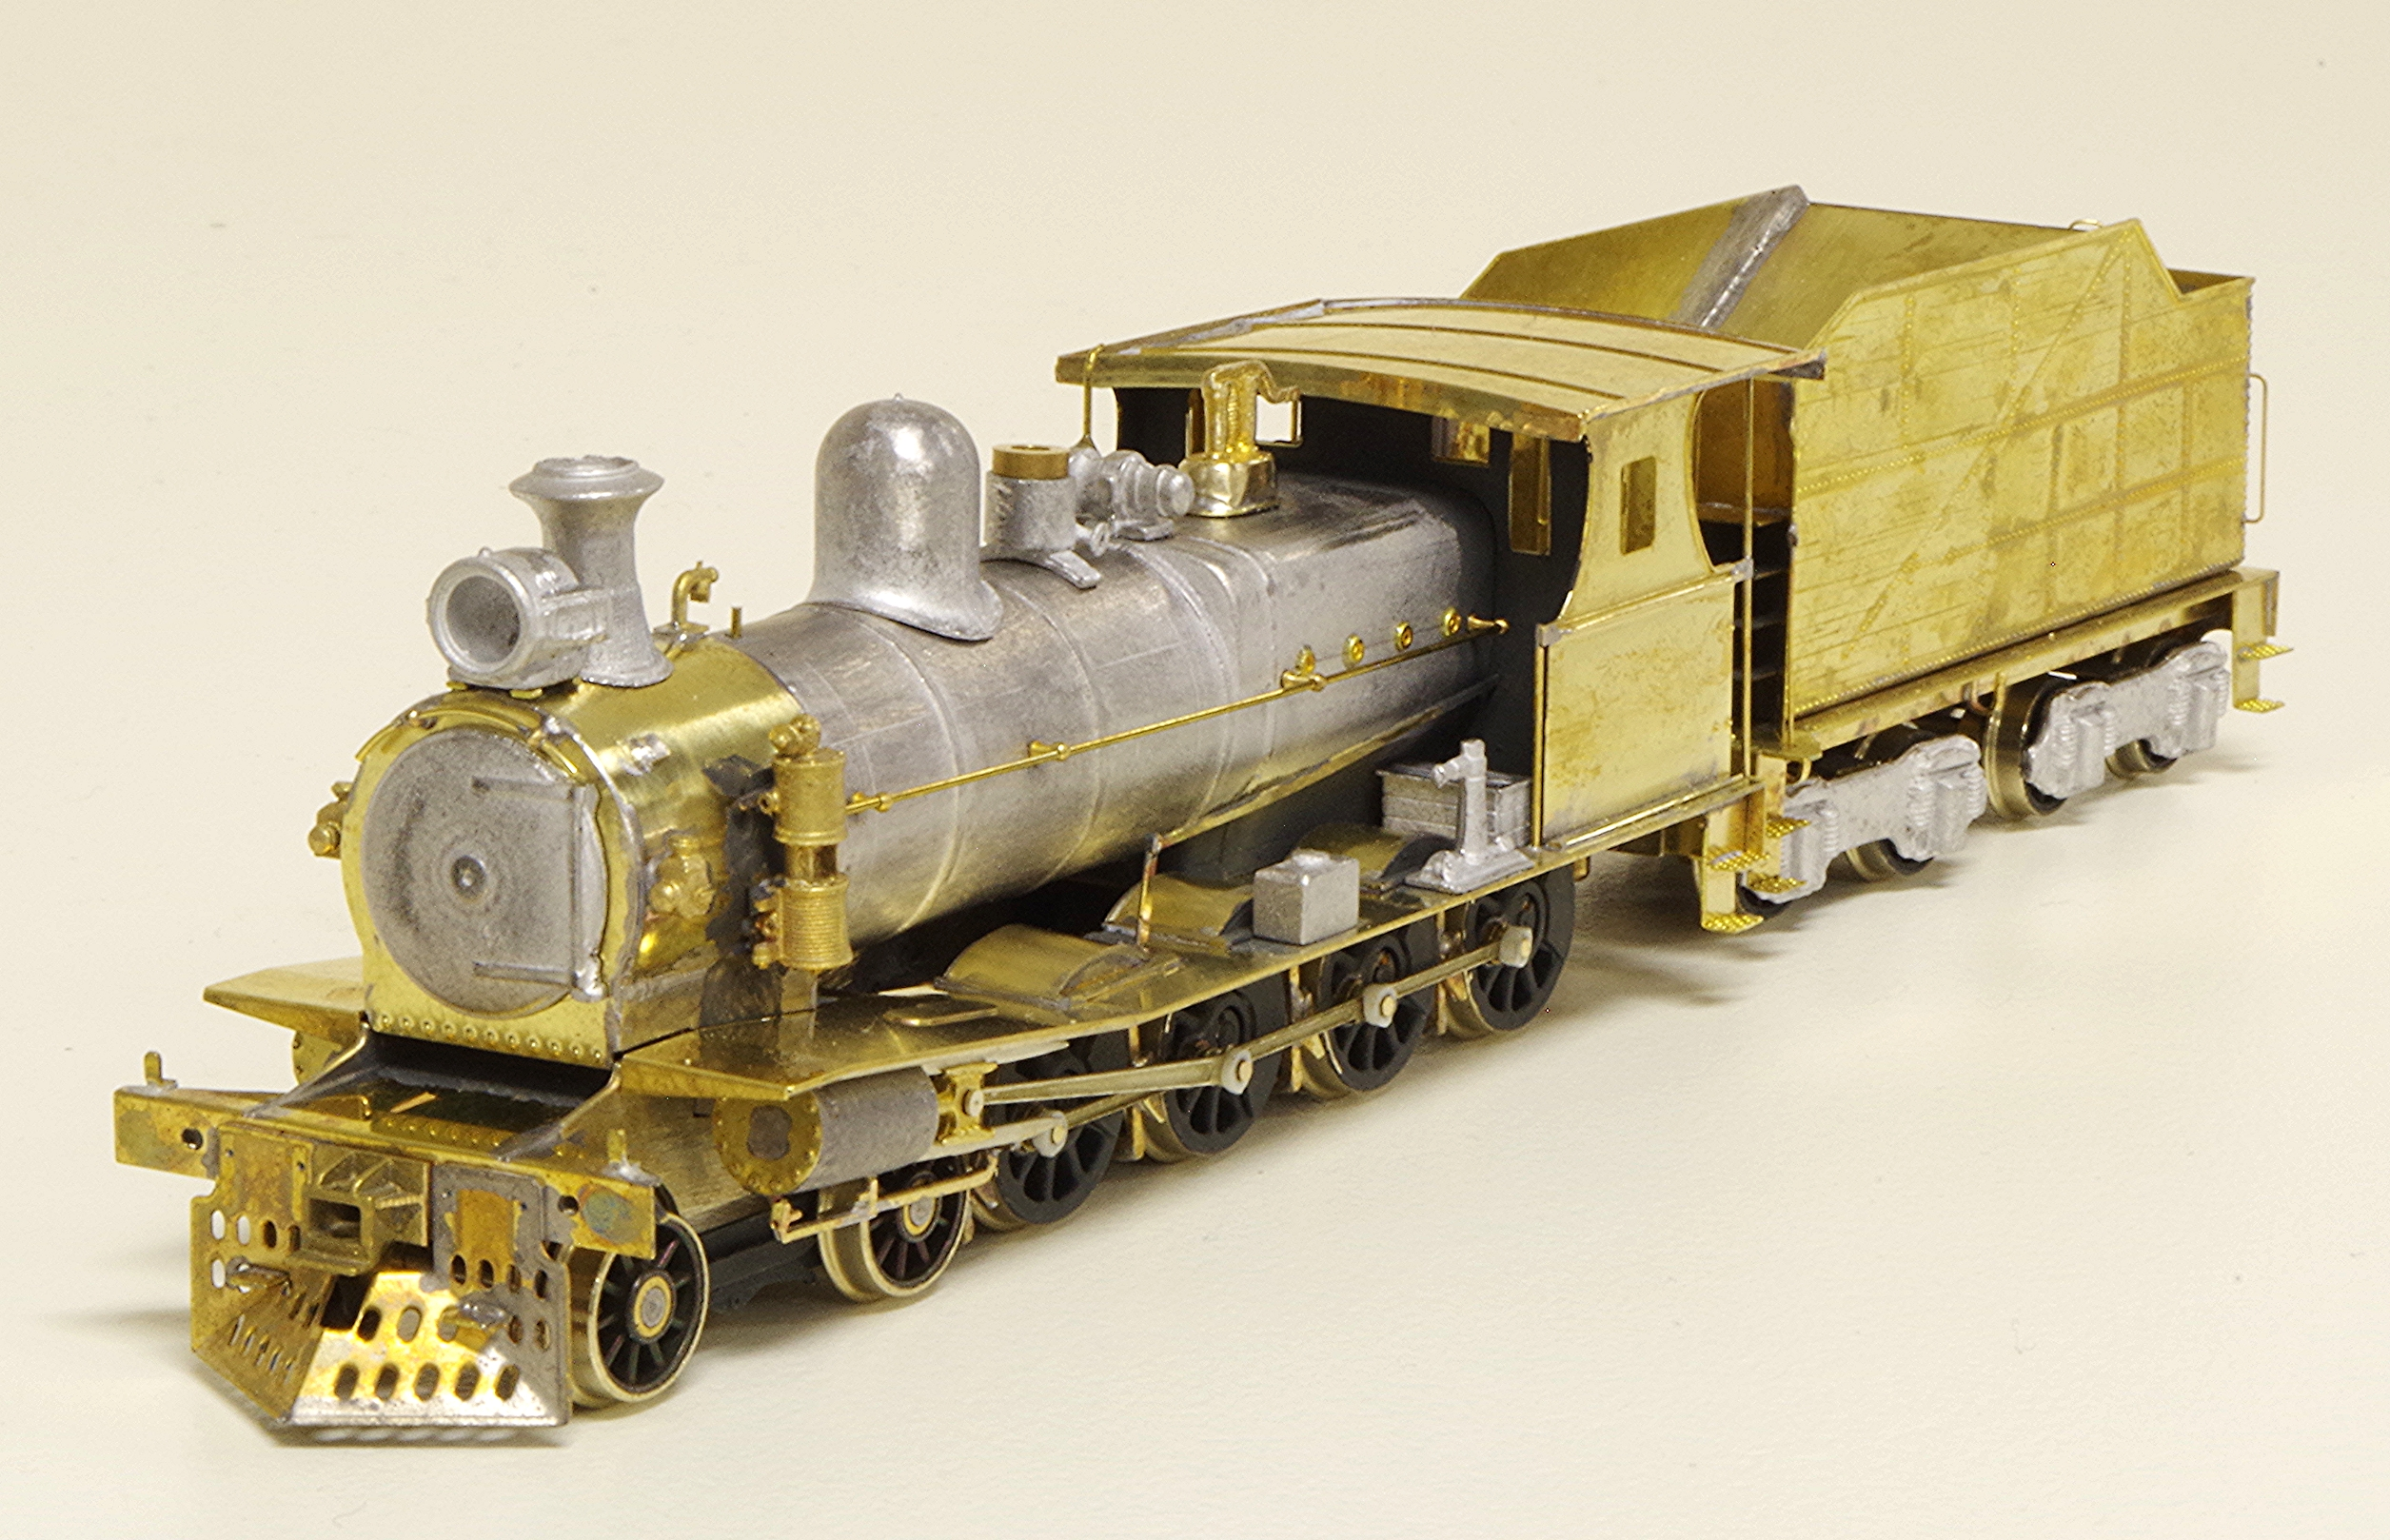 HO scale Tx Class locomotive